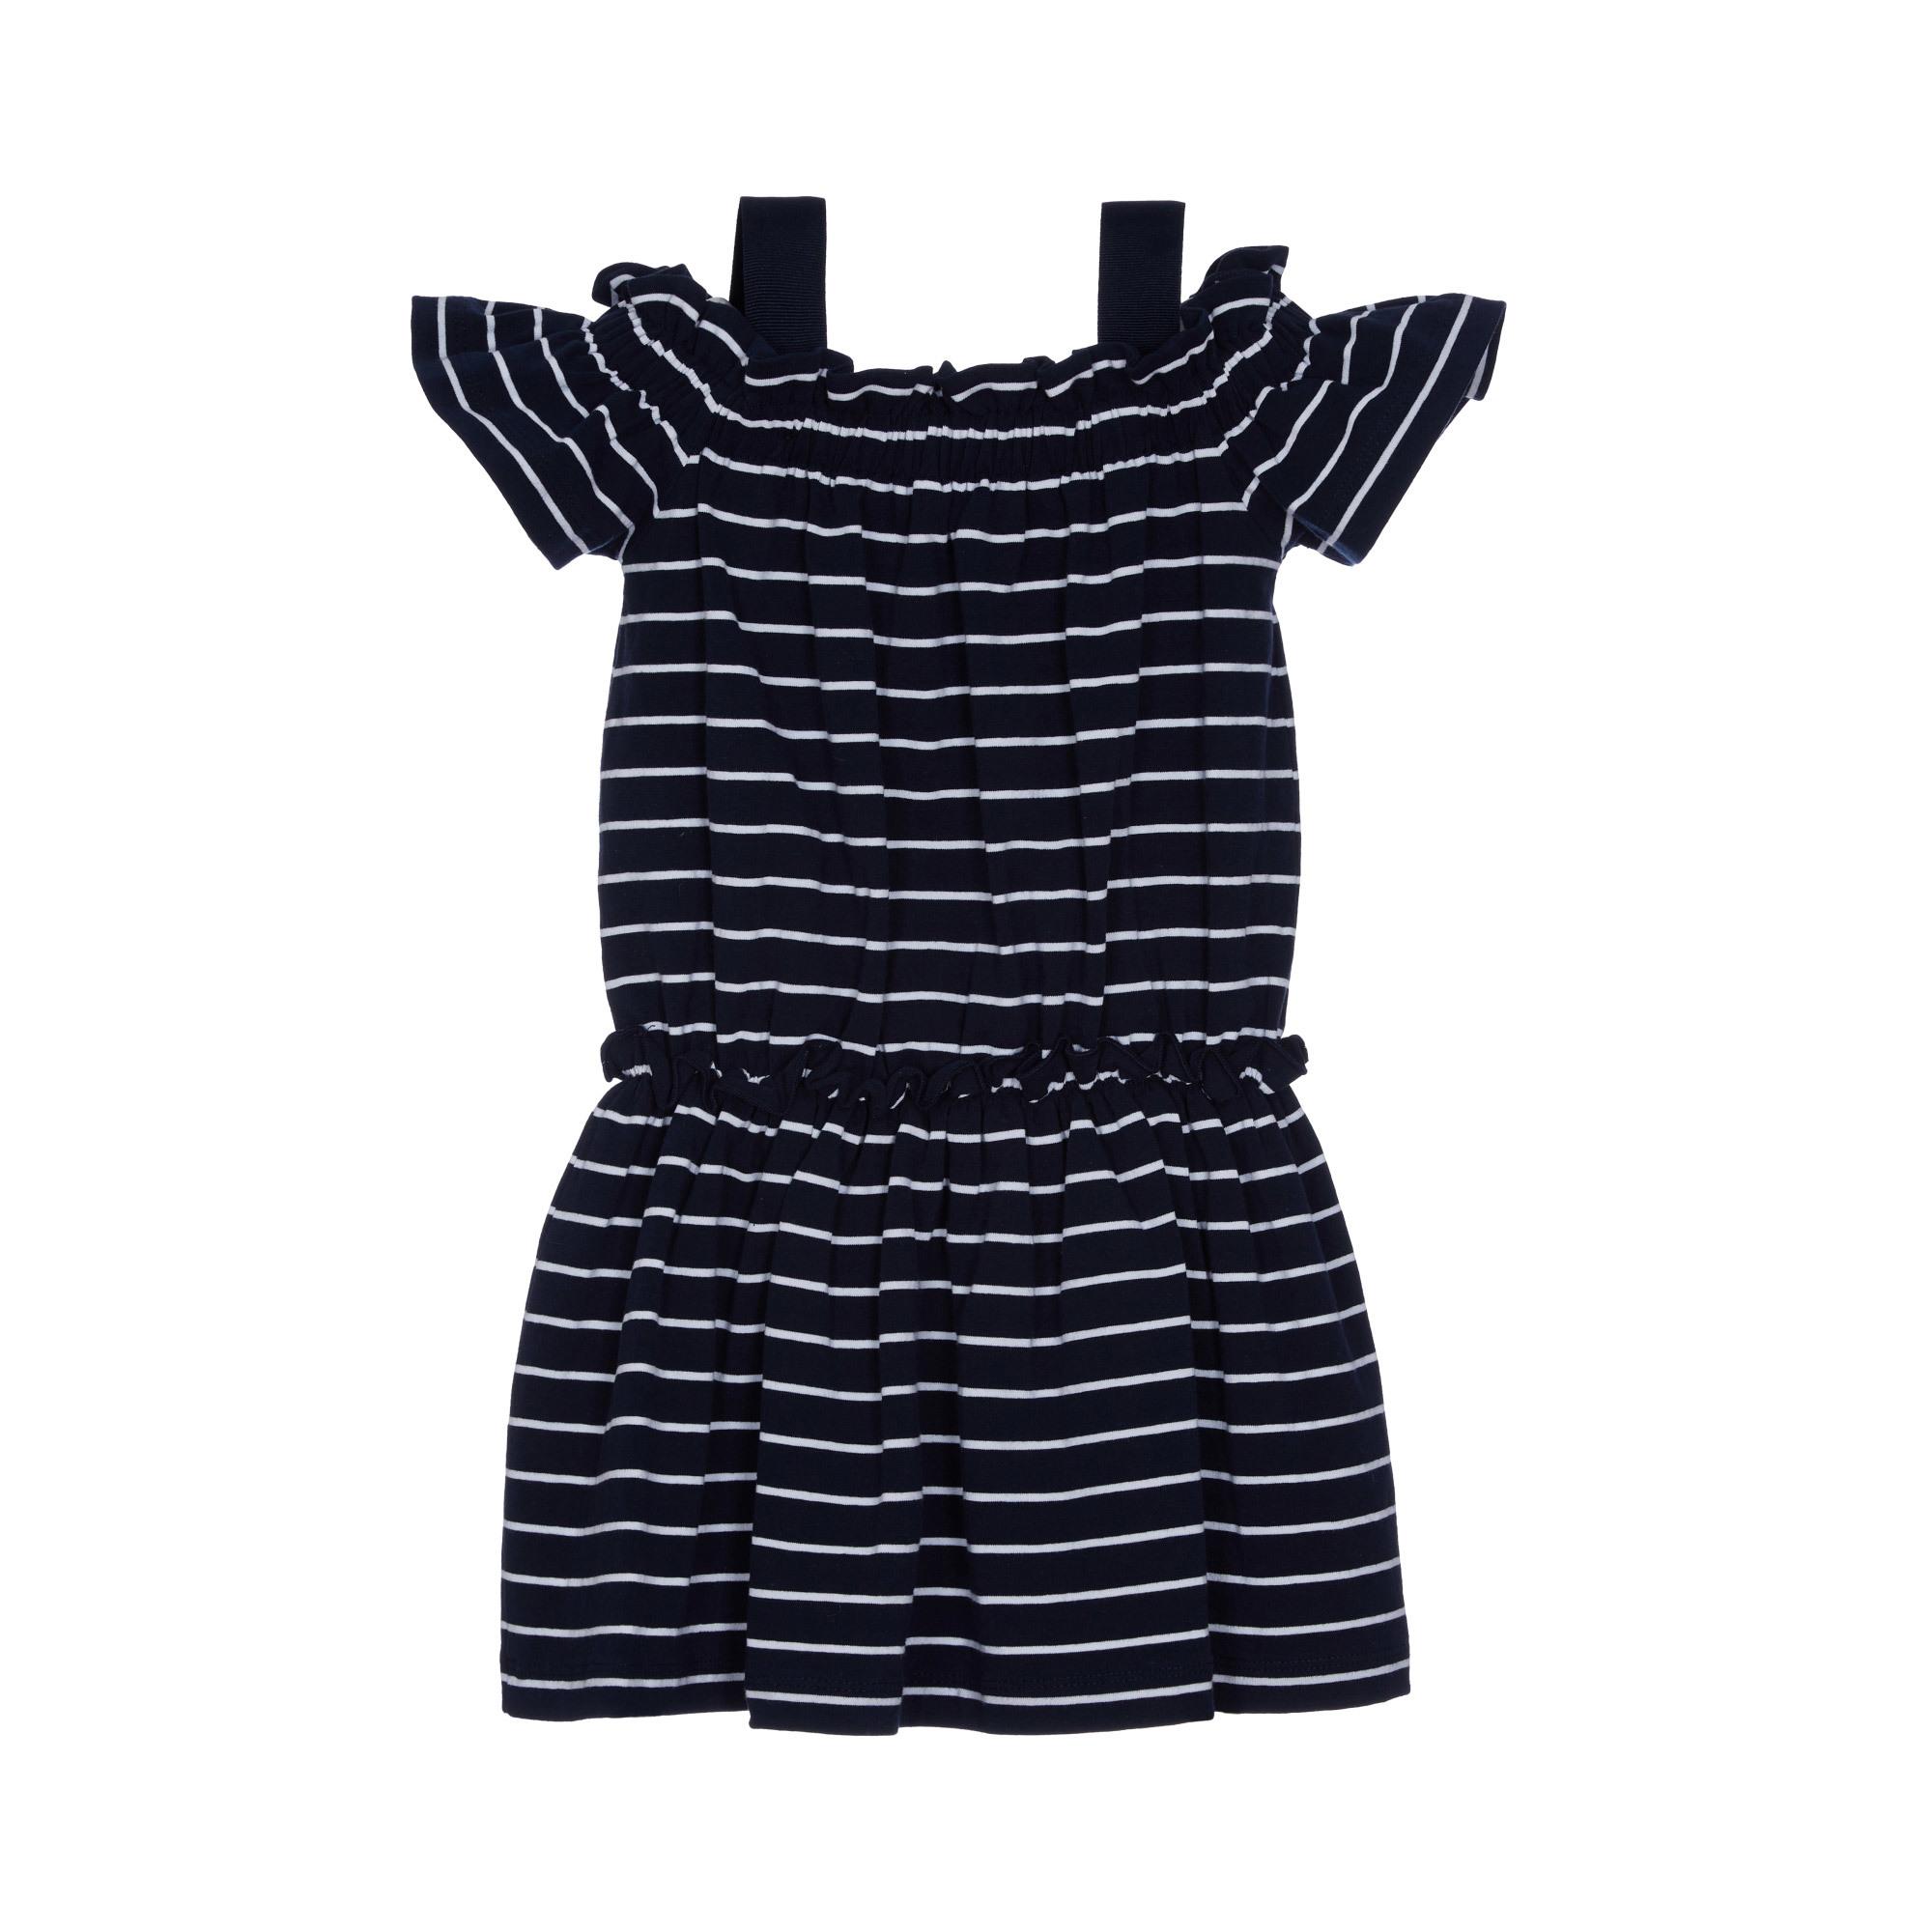 8c9e34cf5e5 Φορέματα-Φούστες - Lapin House